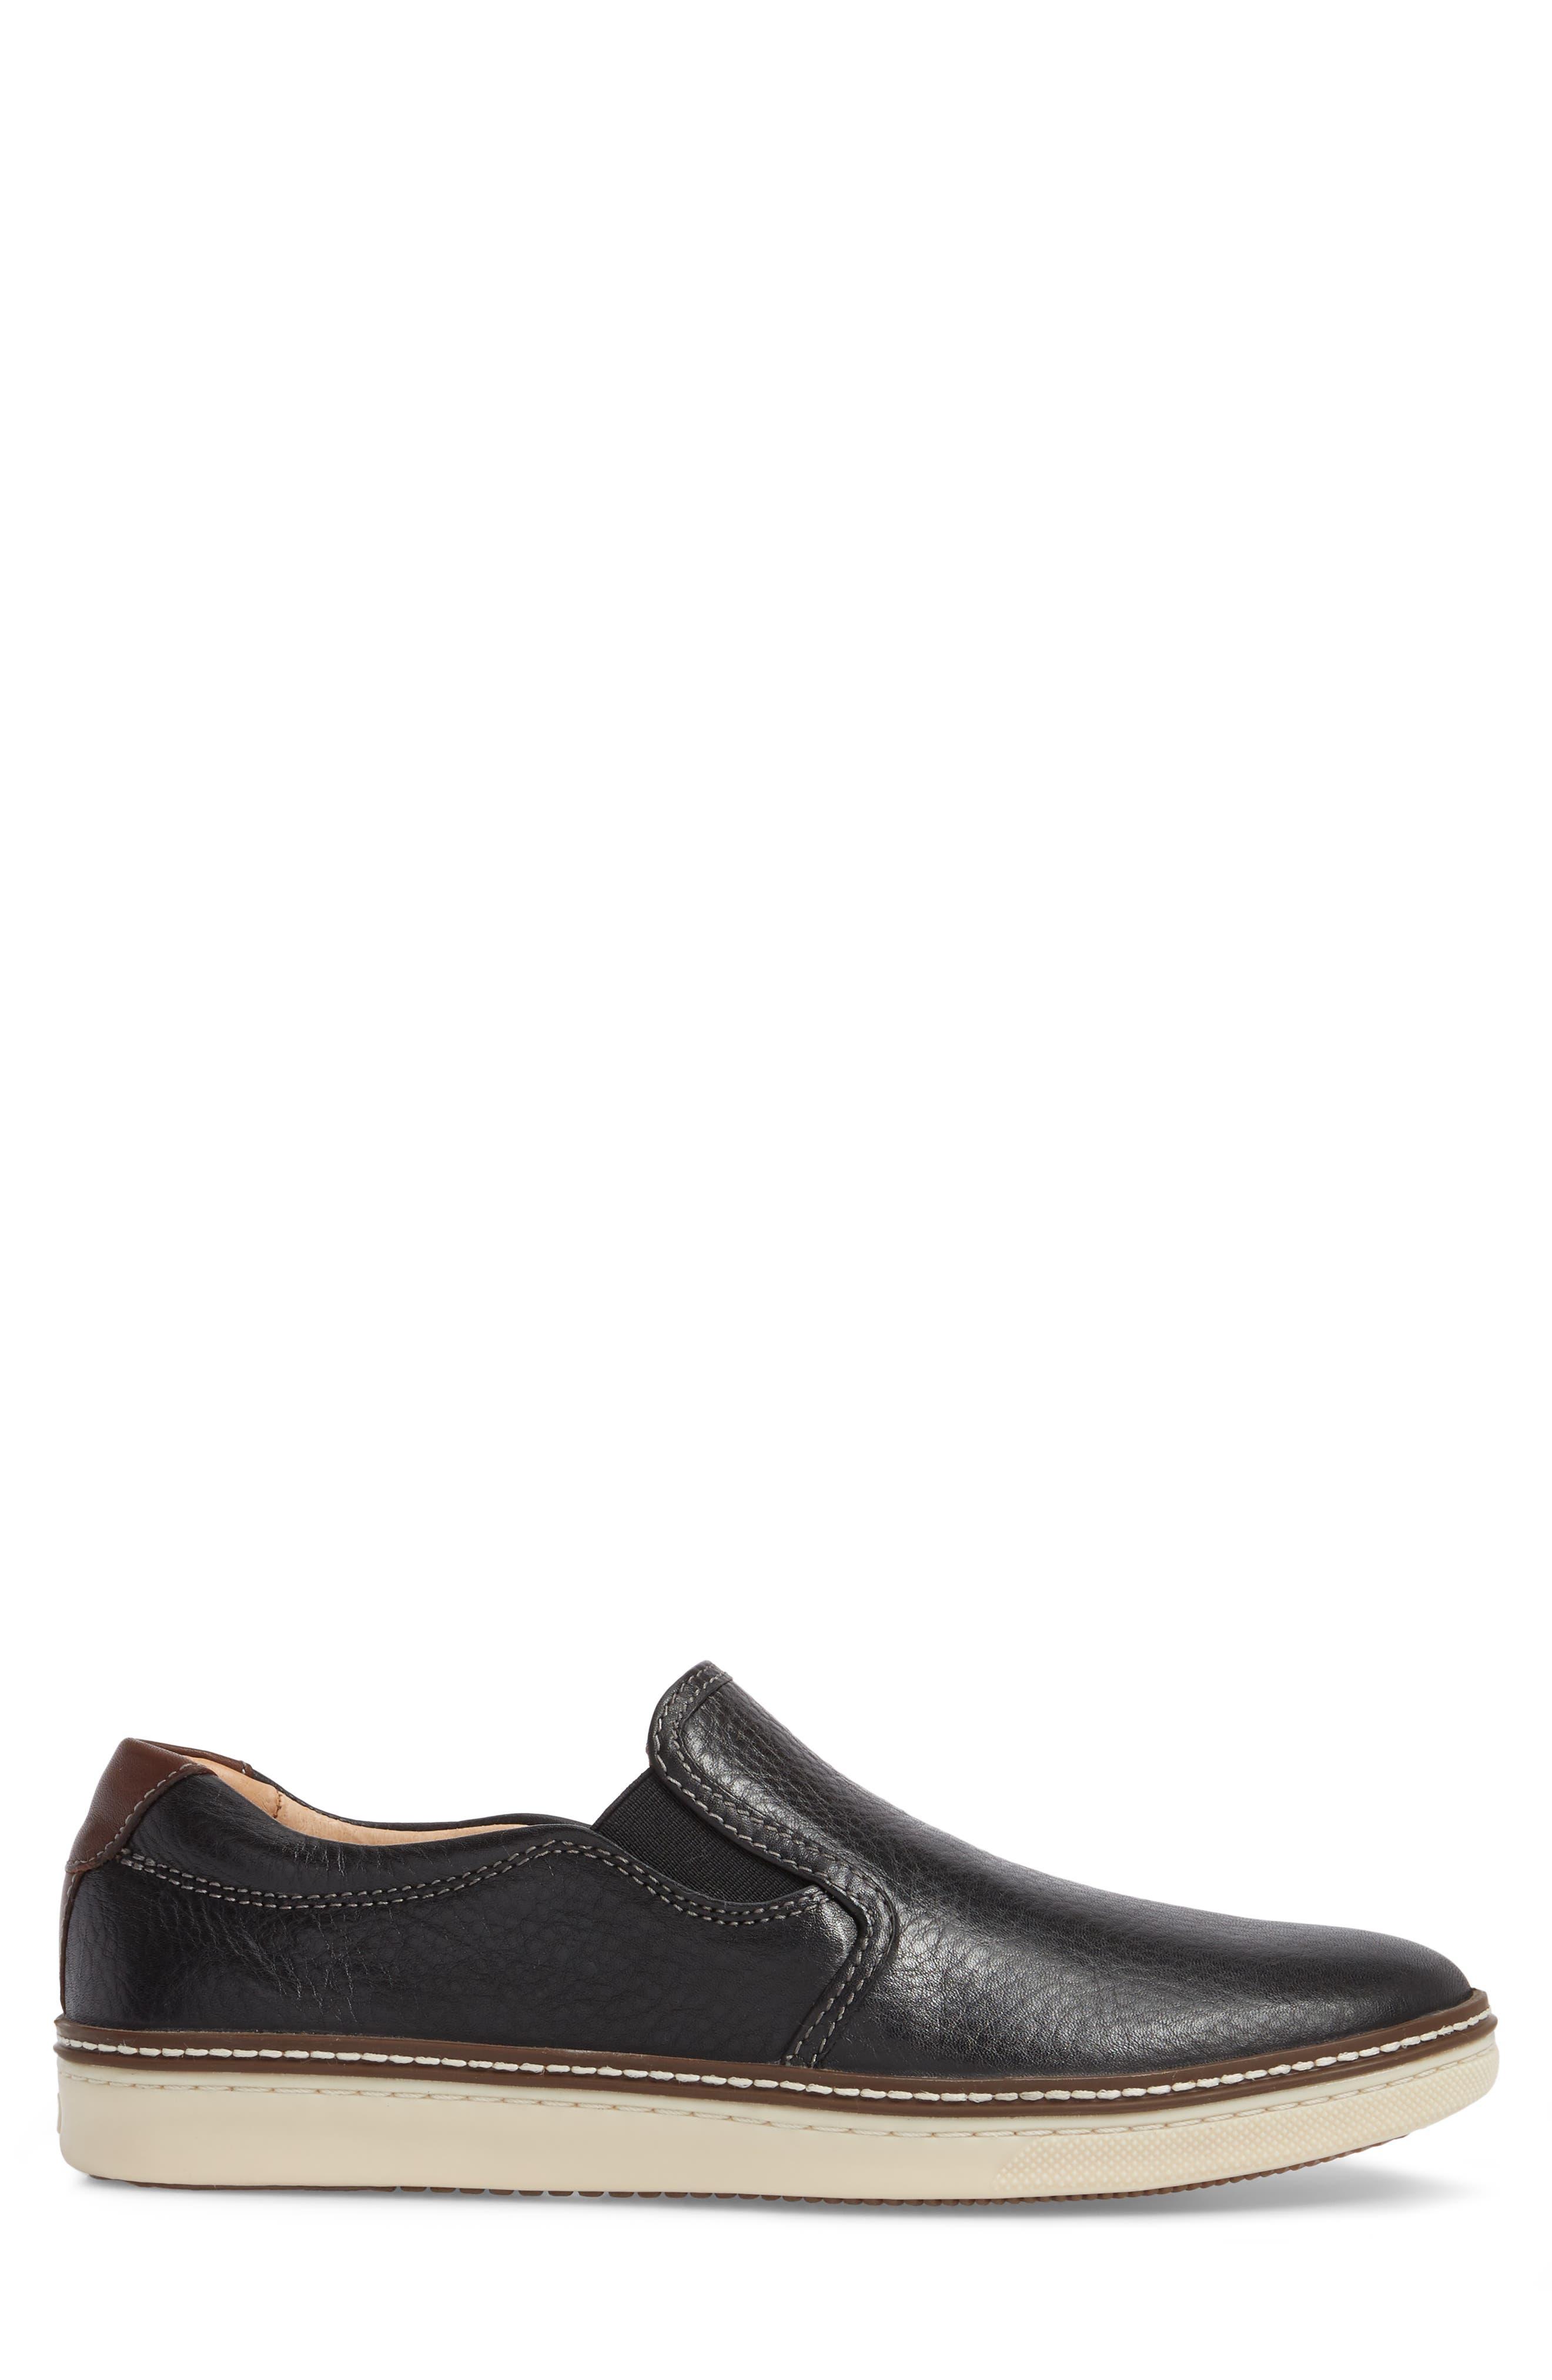 JOHNSTON & MURPHY, McGuffey Slip-On Sneaker, Alternate thumbnail 3, color, BLACK LEATHER